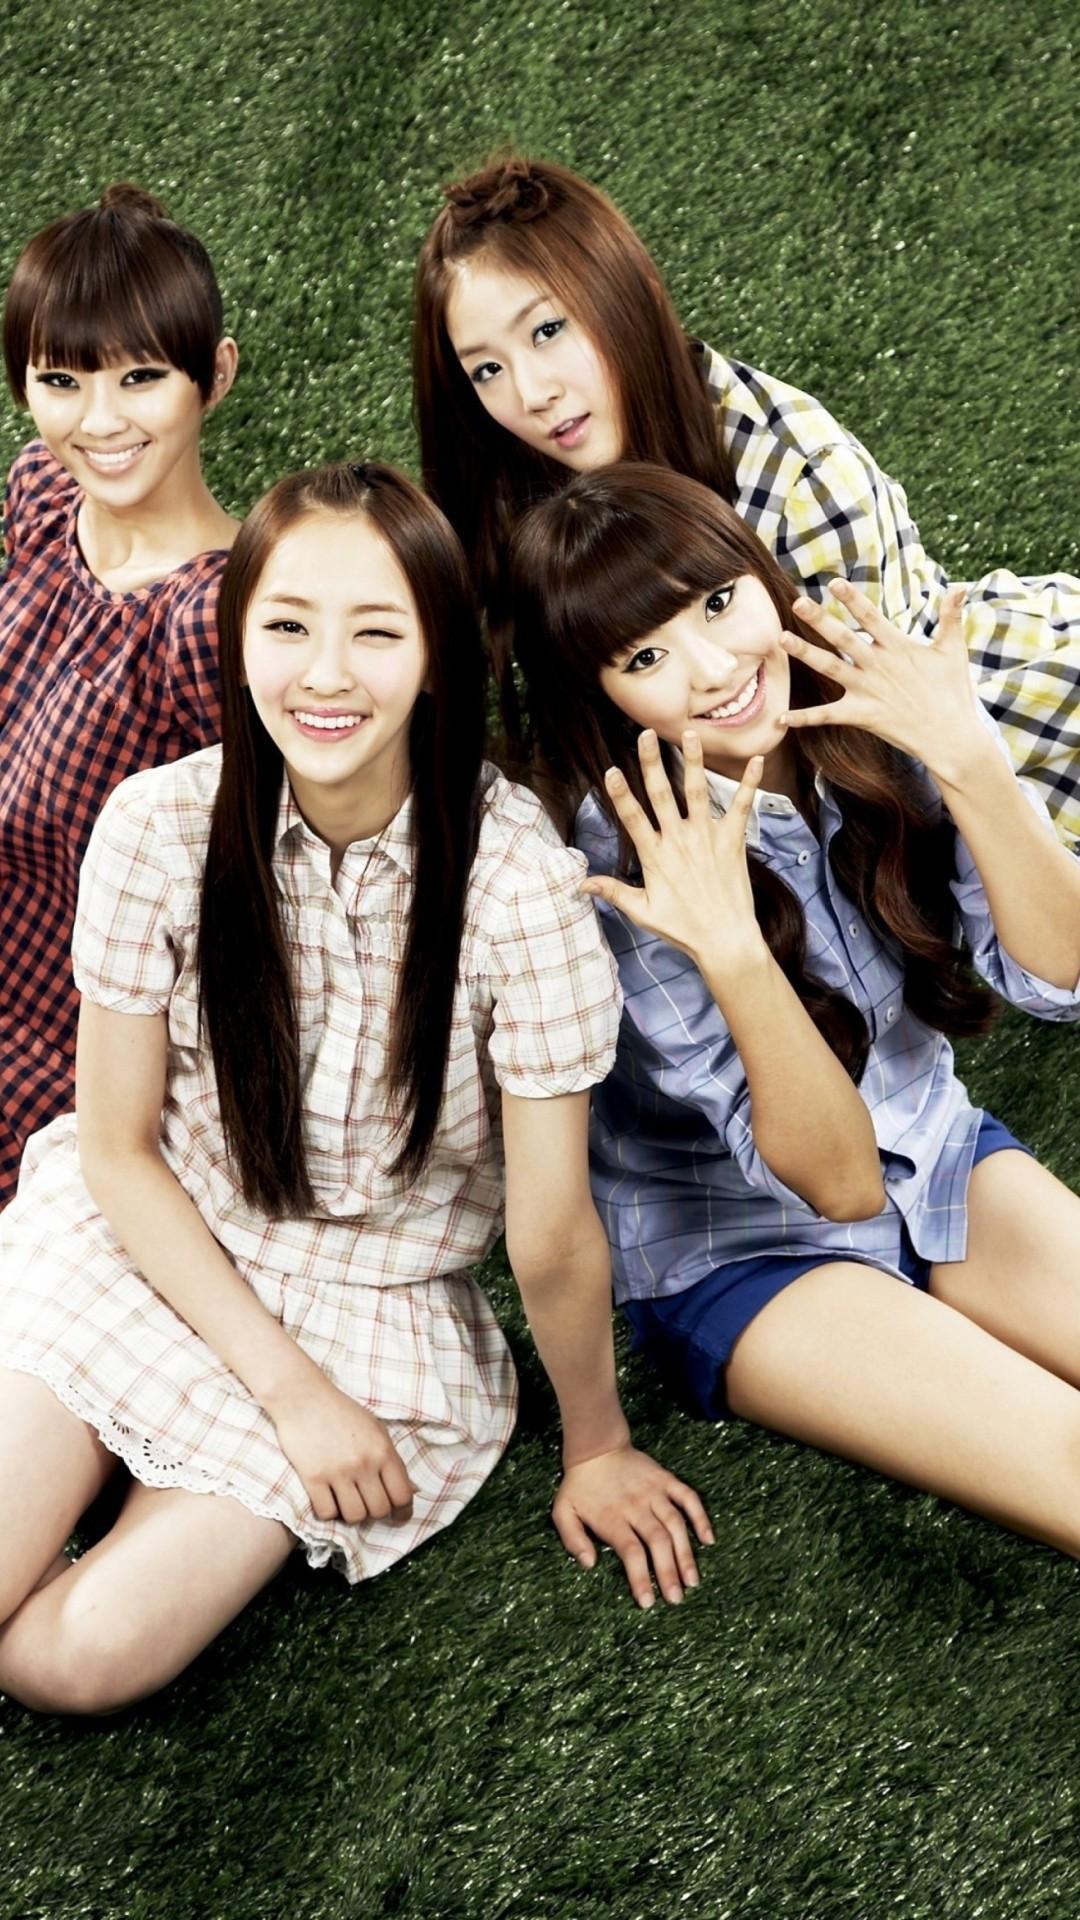 Kpop phone background